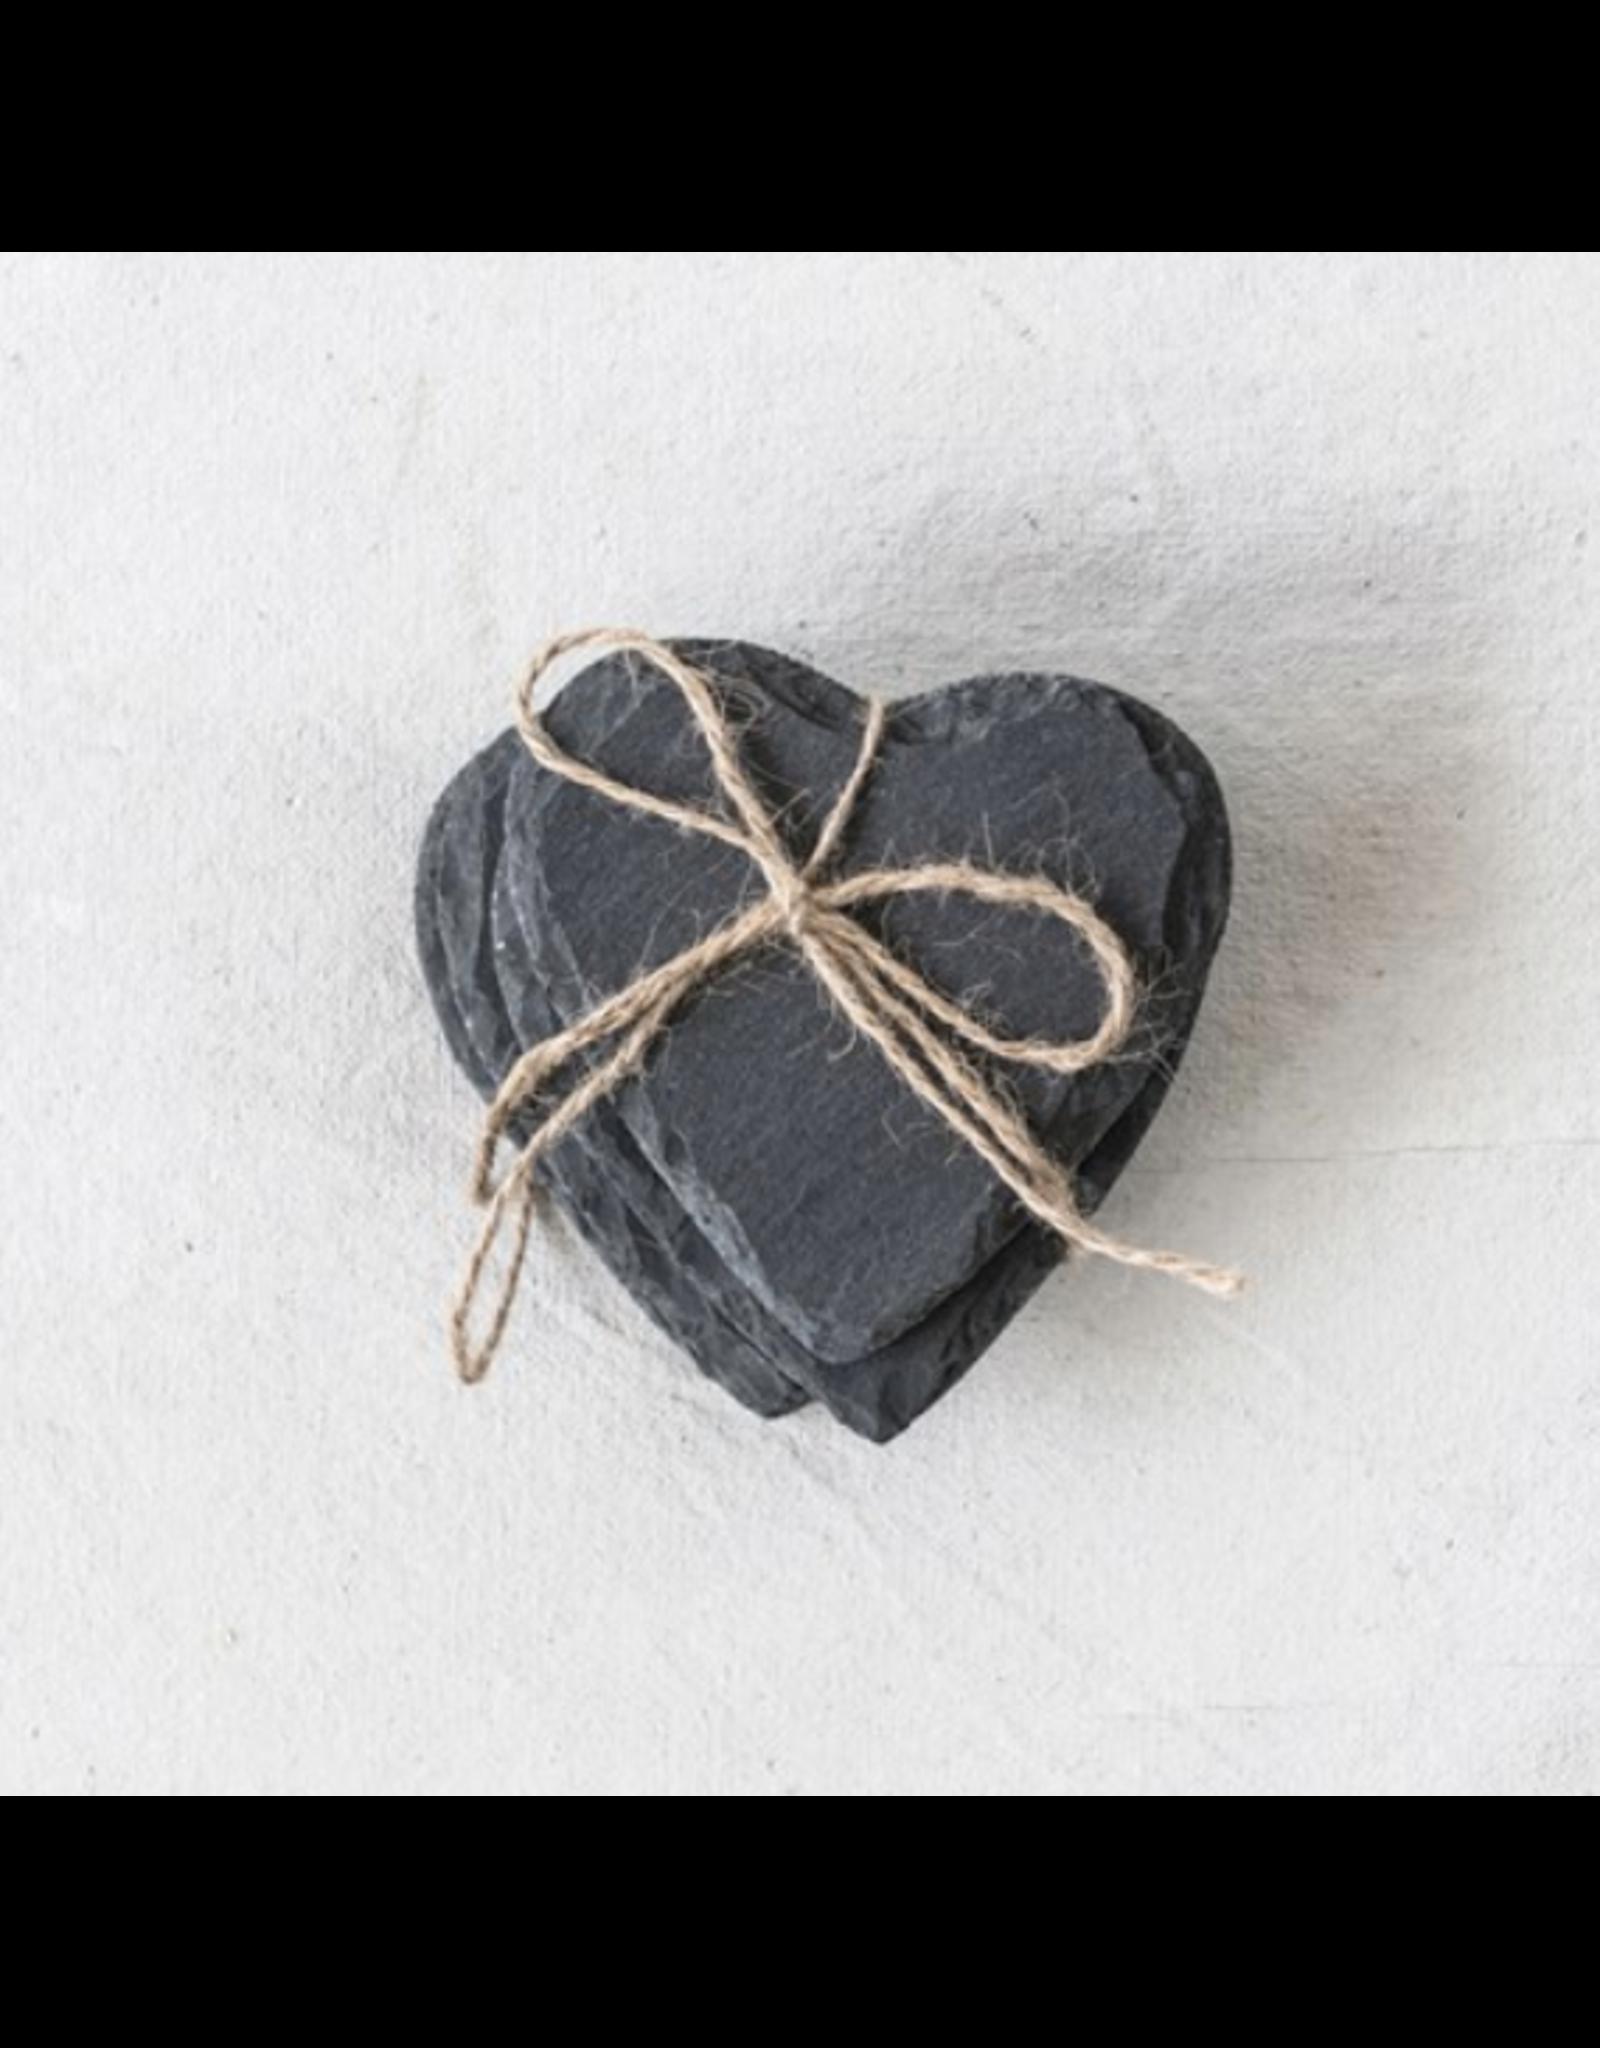 Creative Co-Op Slate Heart Coasters, set of 4 (includes engraving)